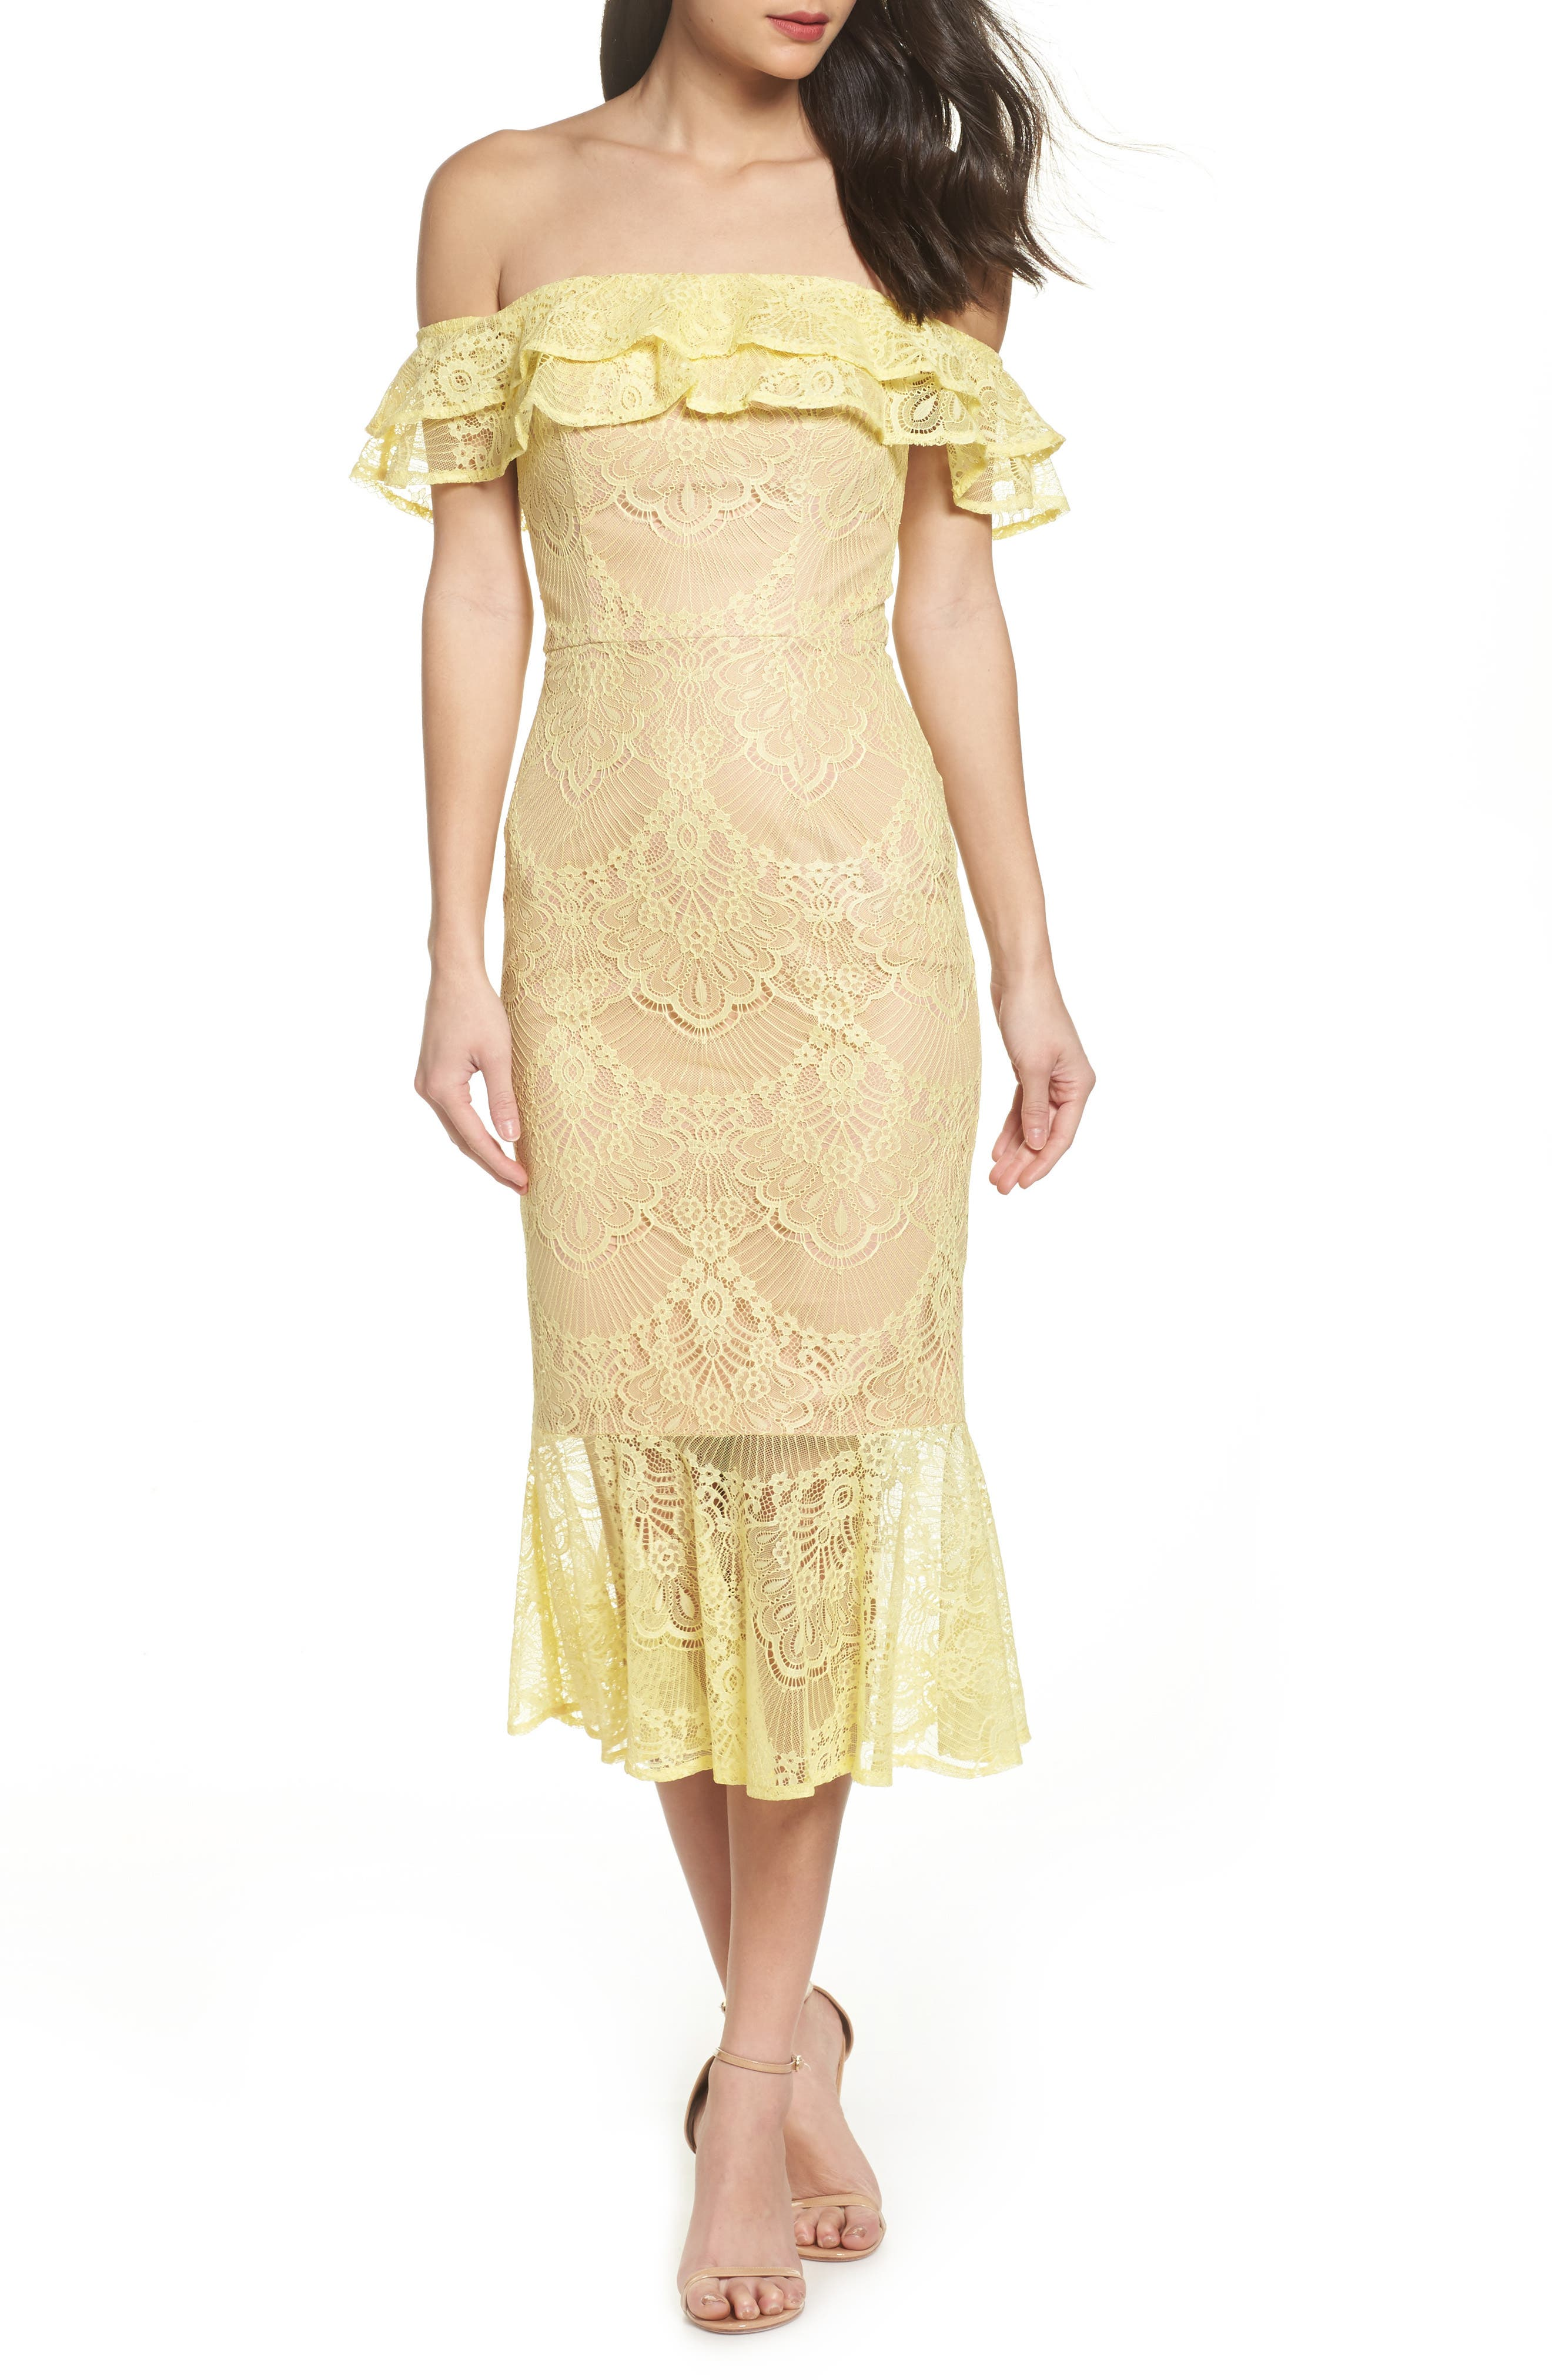 Toril Off the Shoulder Lace Midi Dress,                             Main thumbnail 1, color,                             742